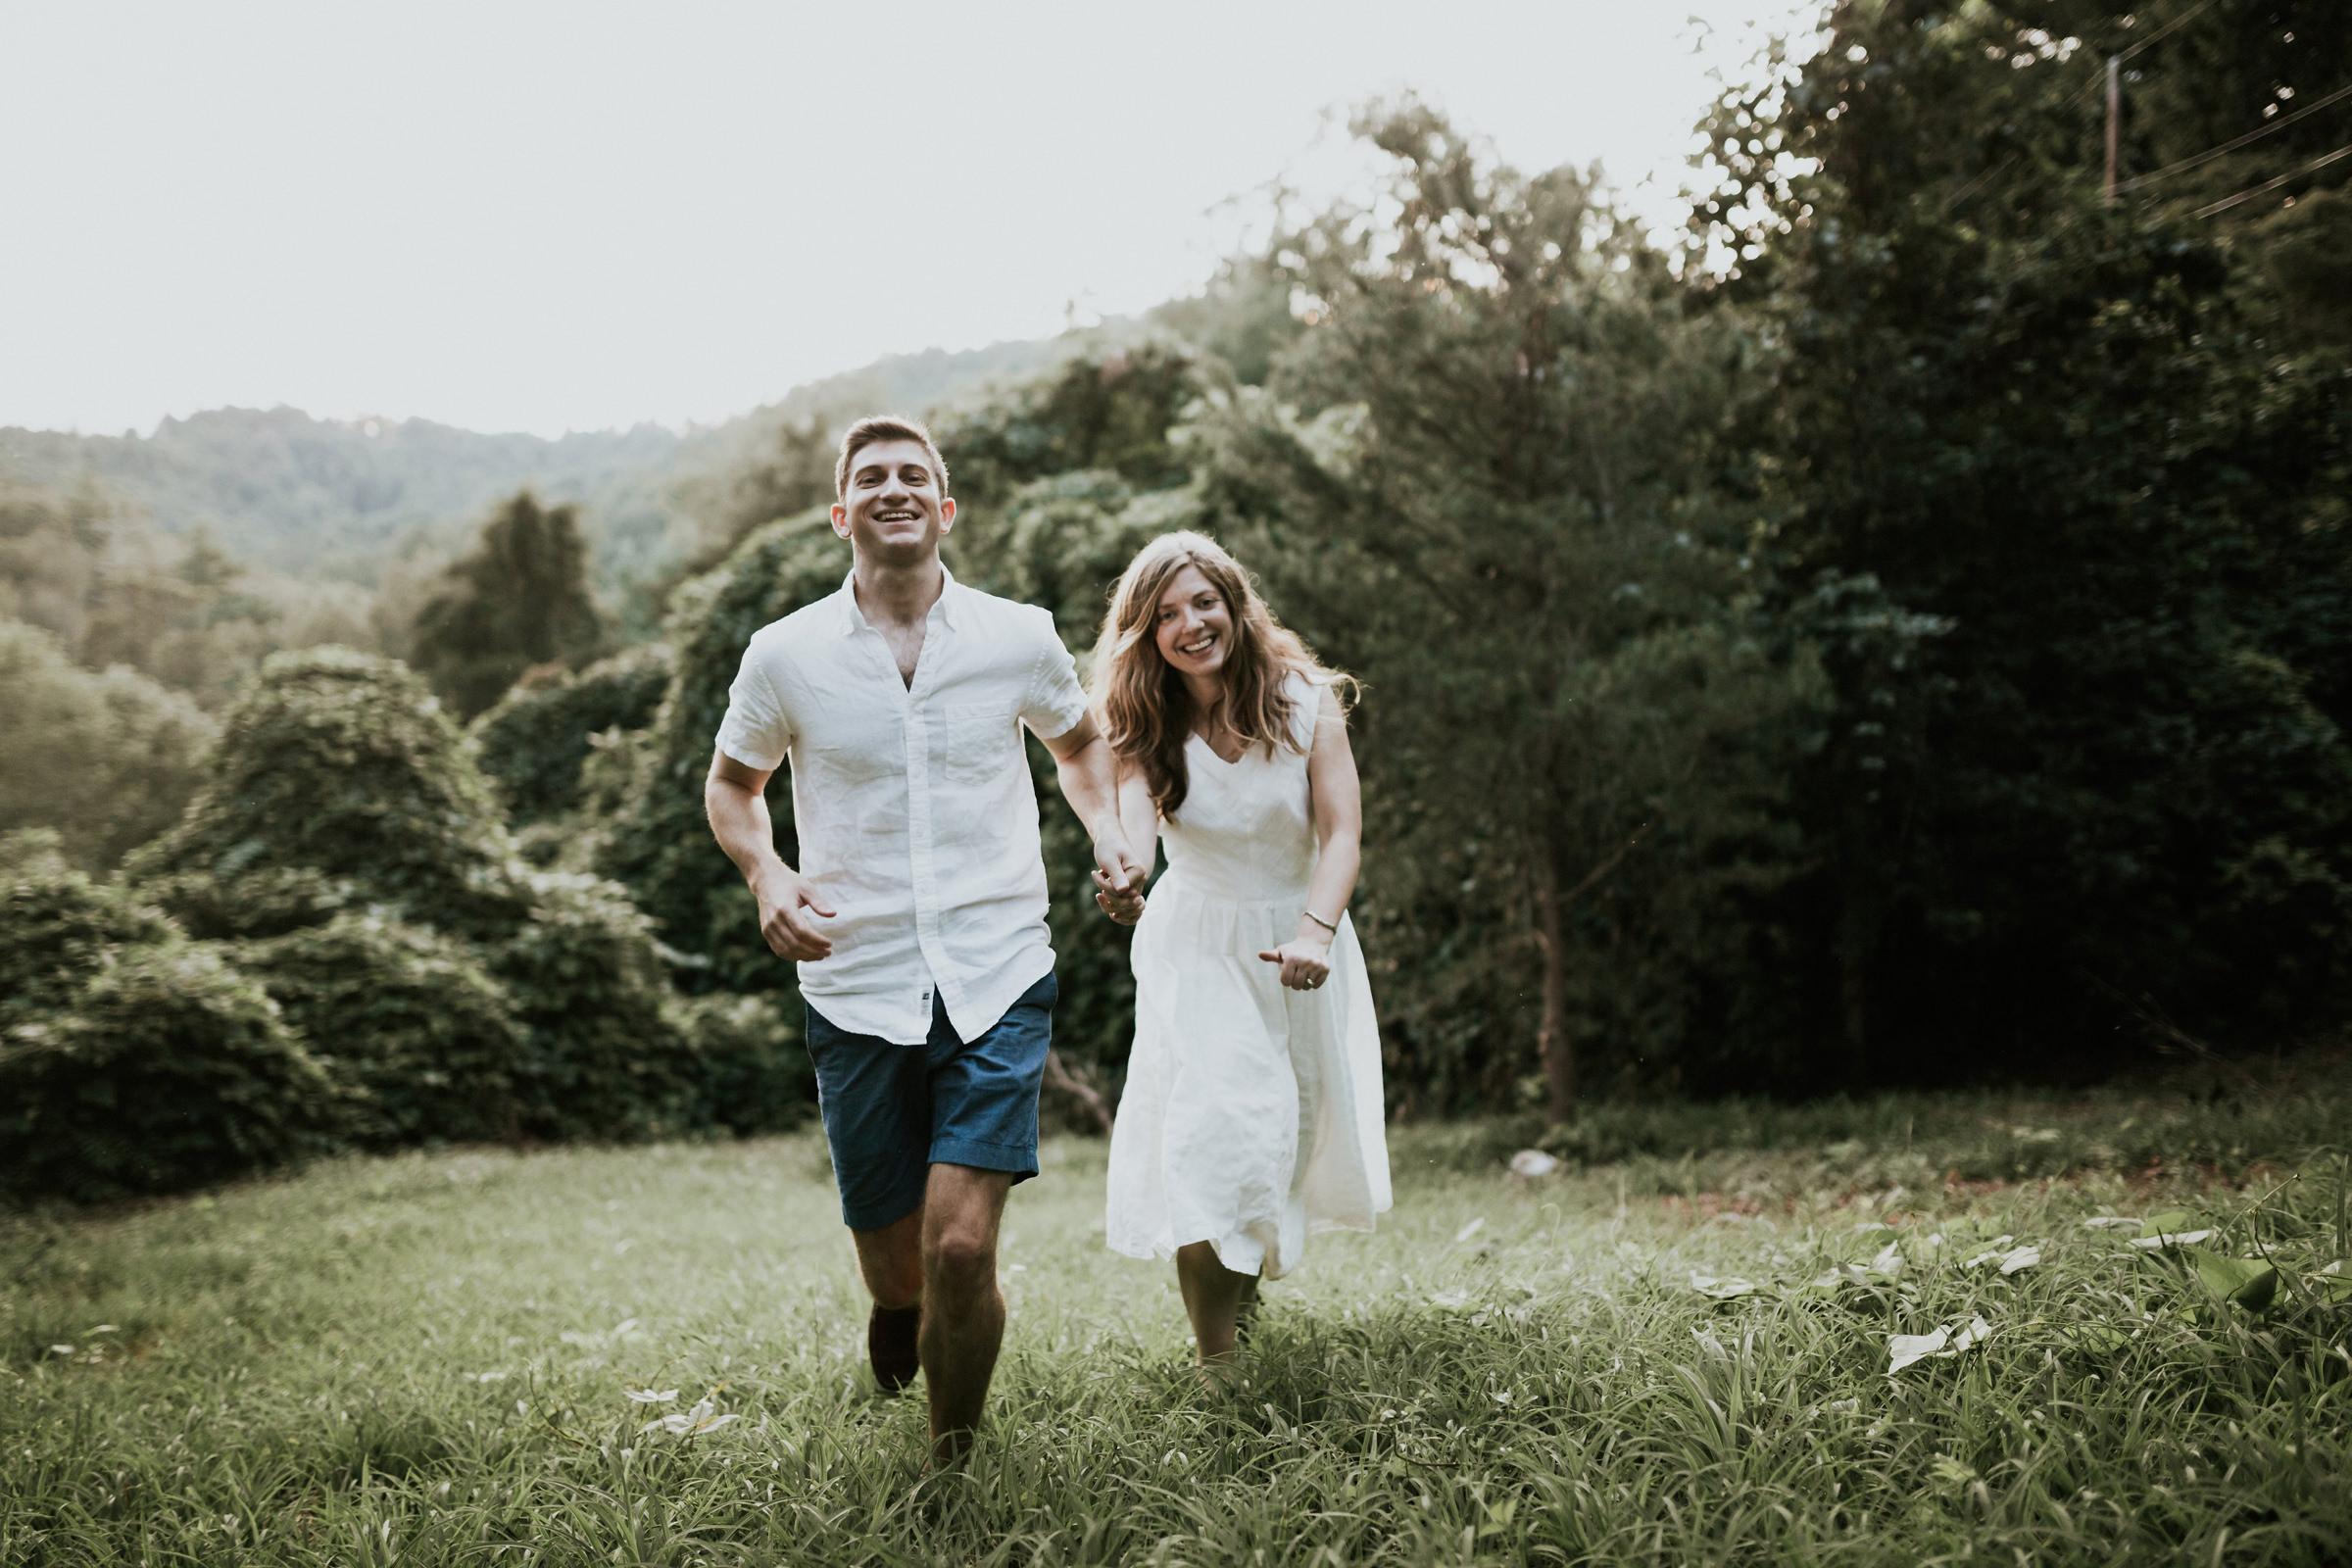 Kentucky_Candid_Wedding_Photographer_138.jpg